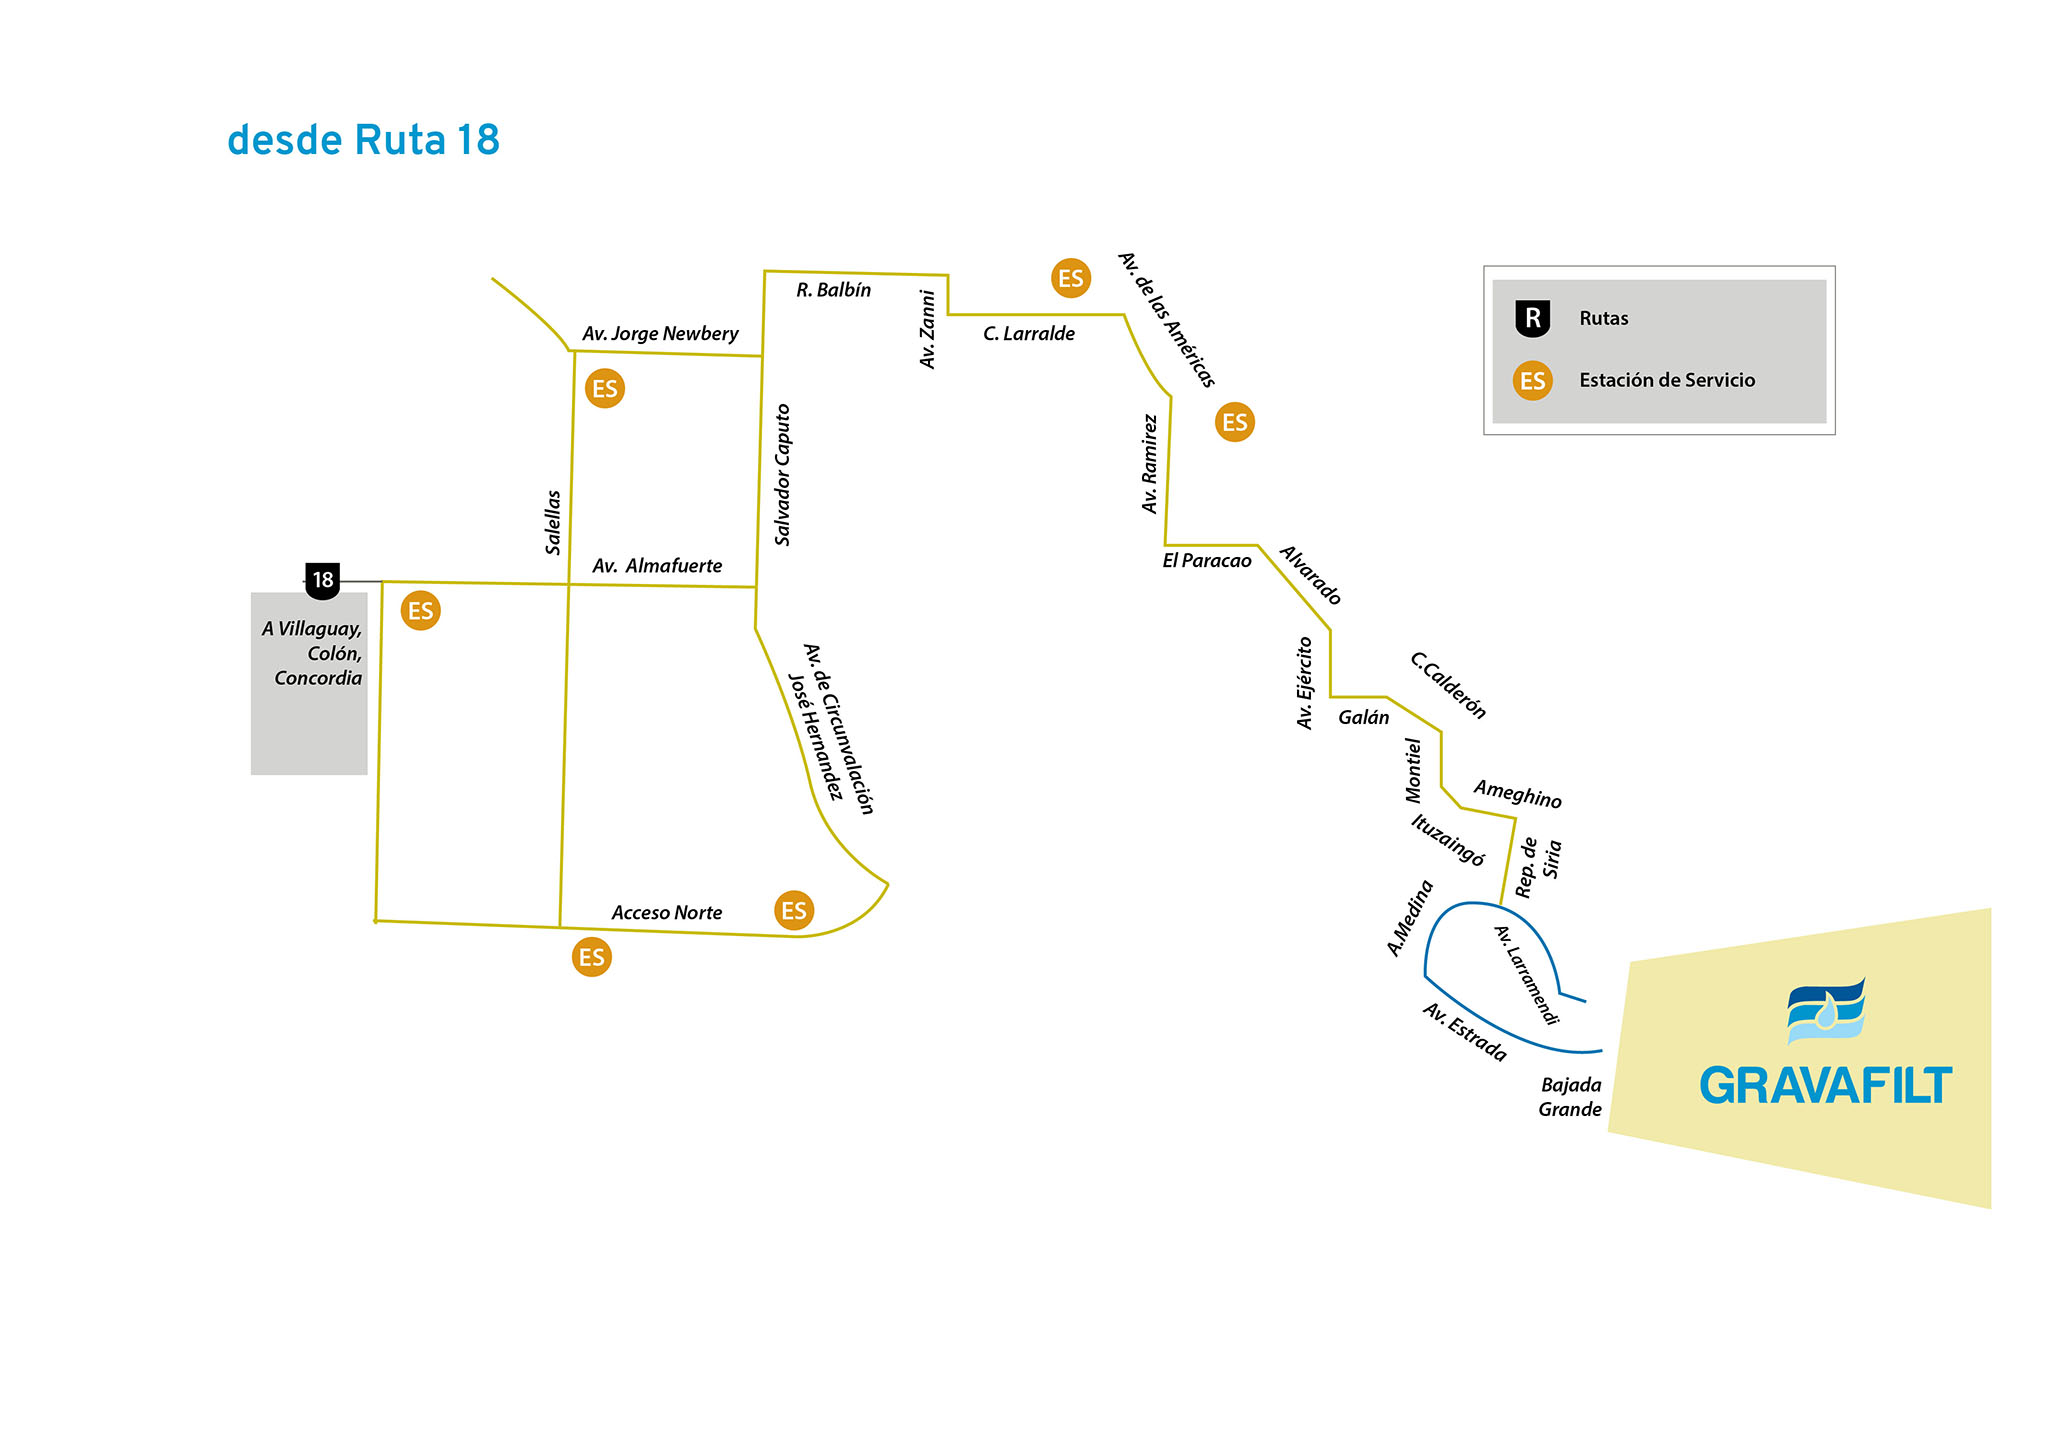 03 Mapa_desde RVillaguay